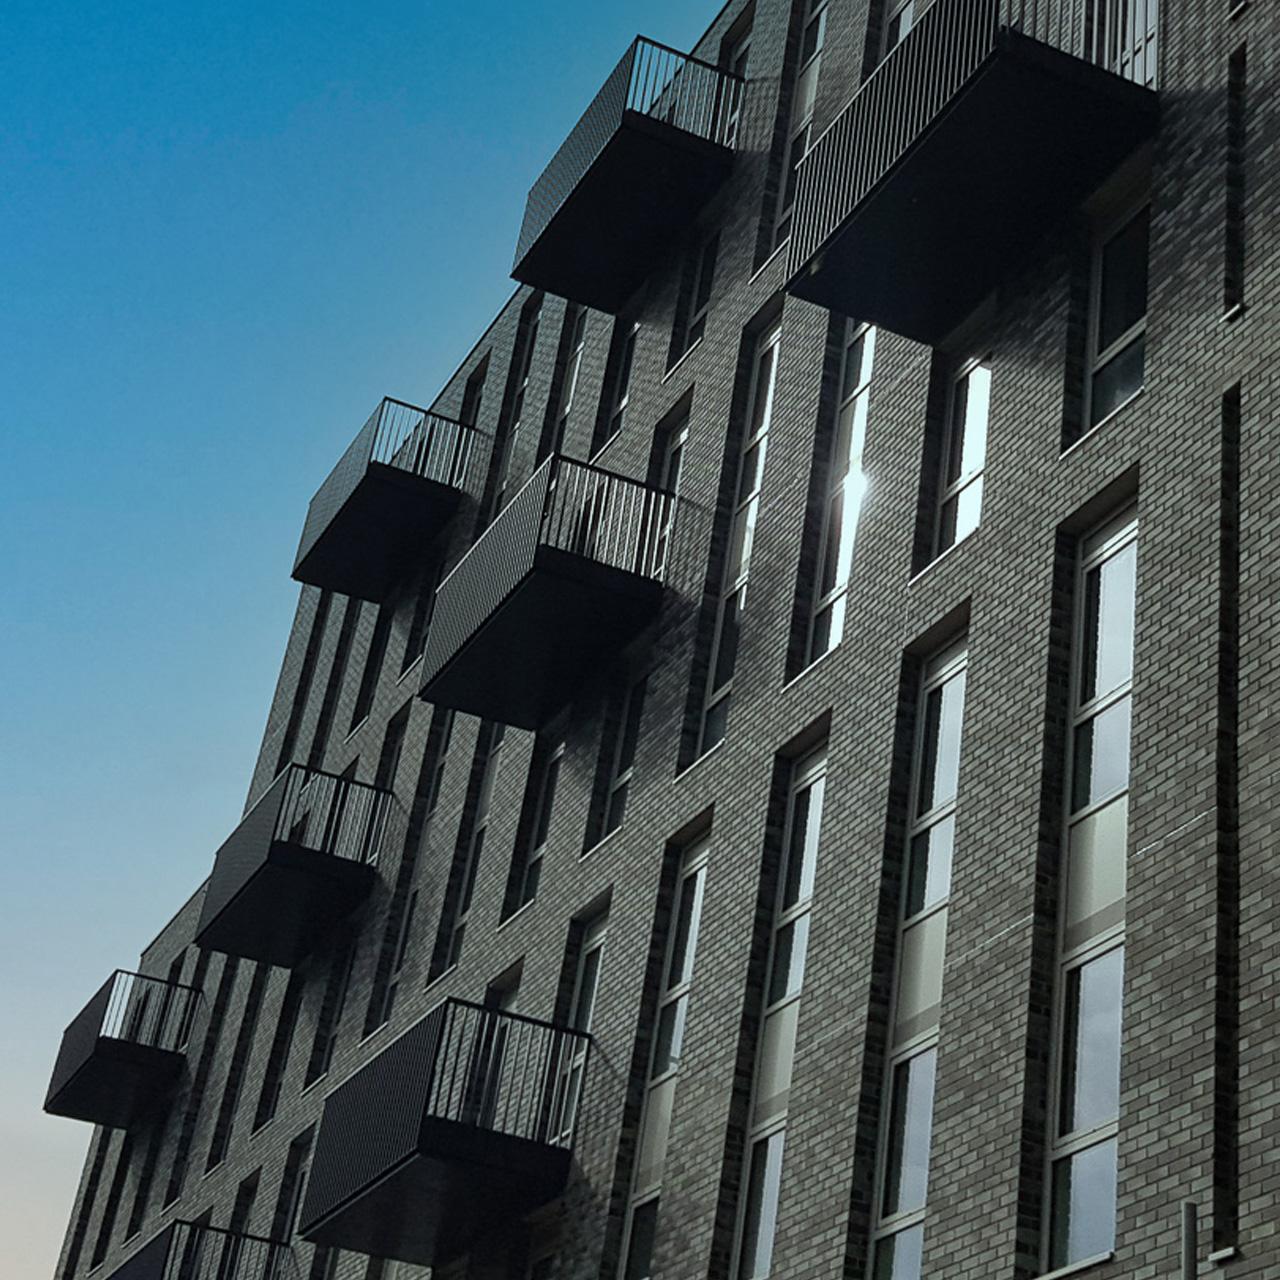 modular balconies that meet current aesthetics